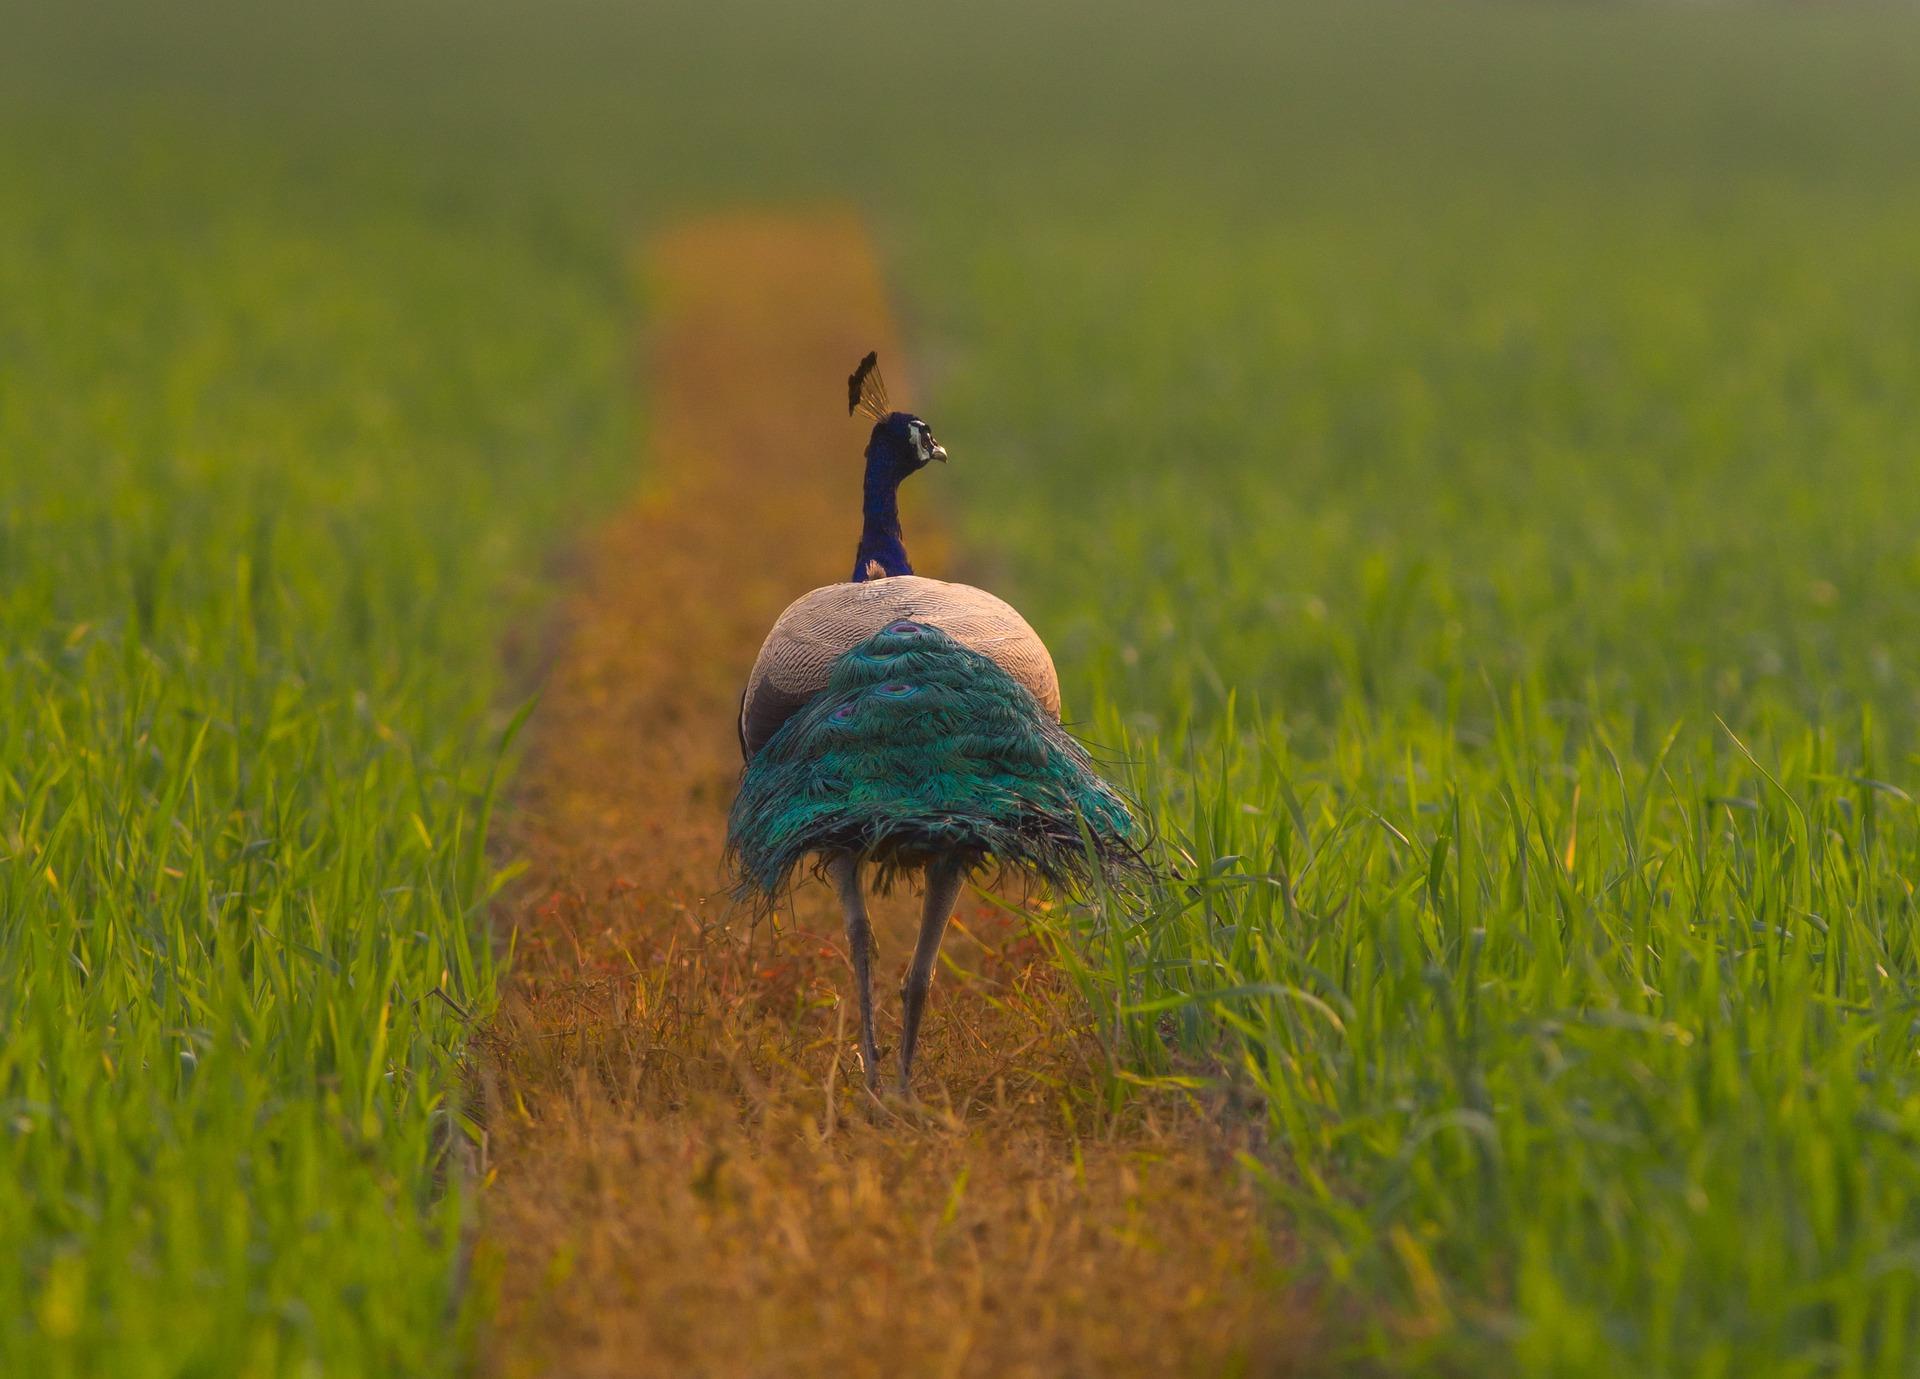 Peacock India